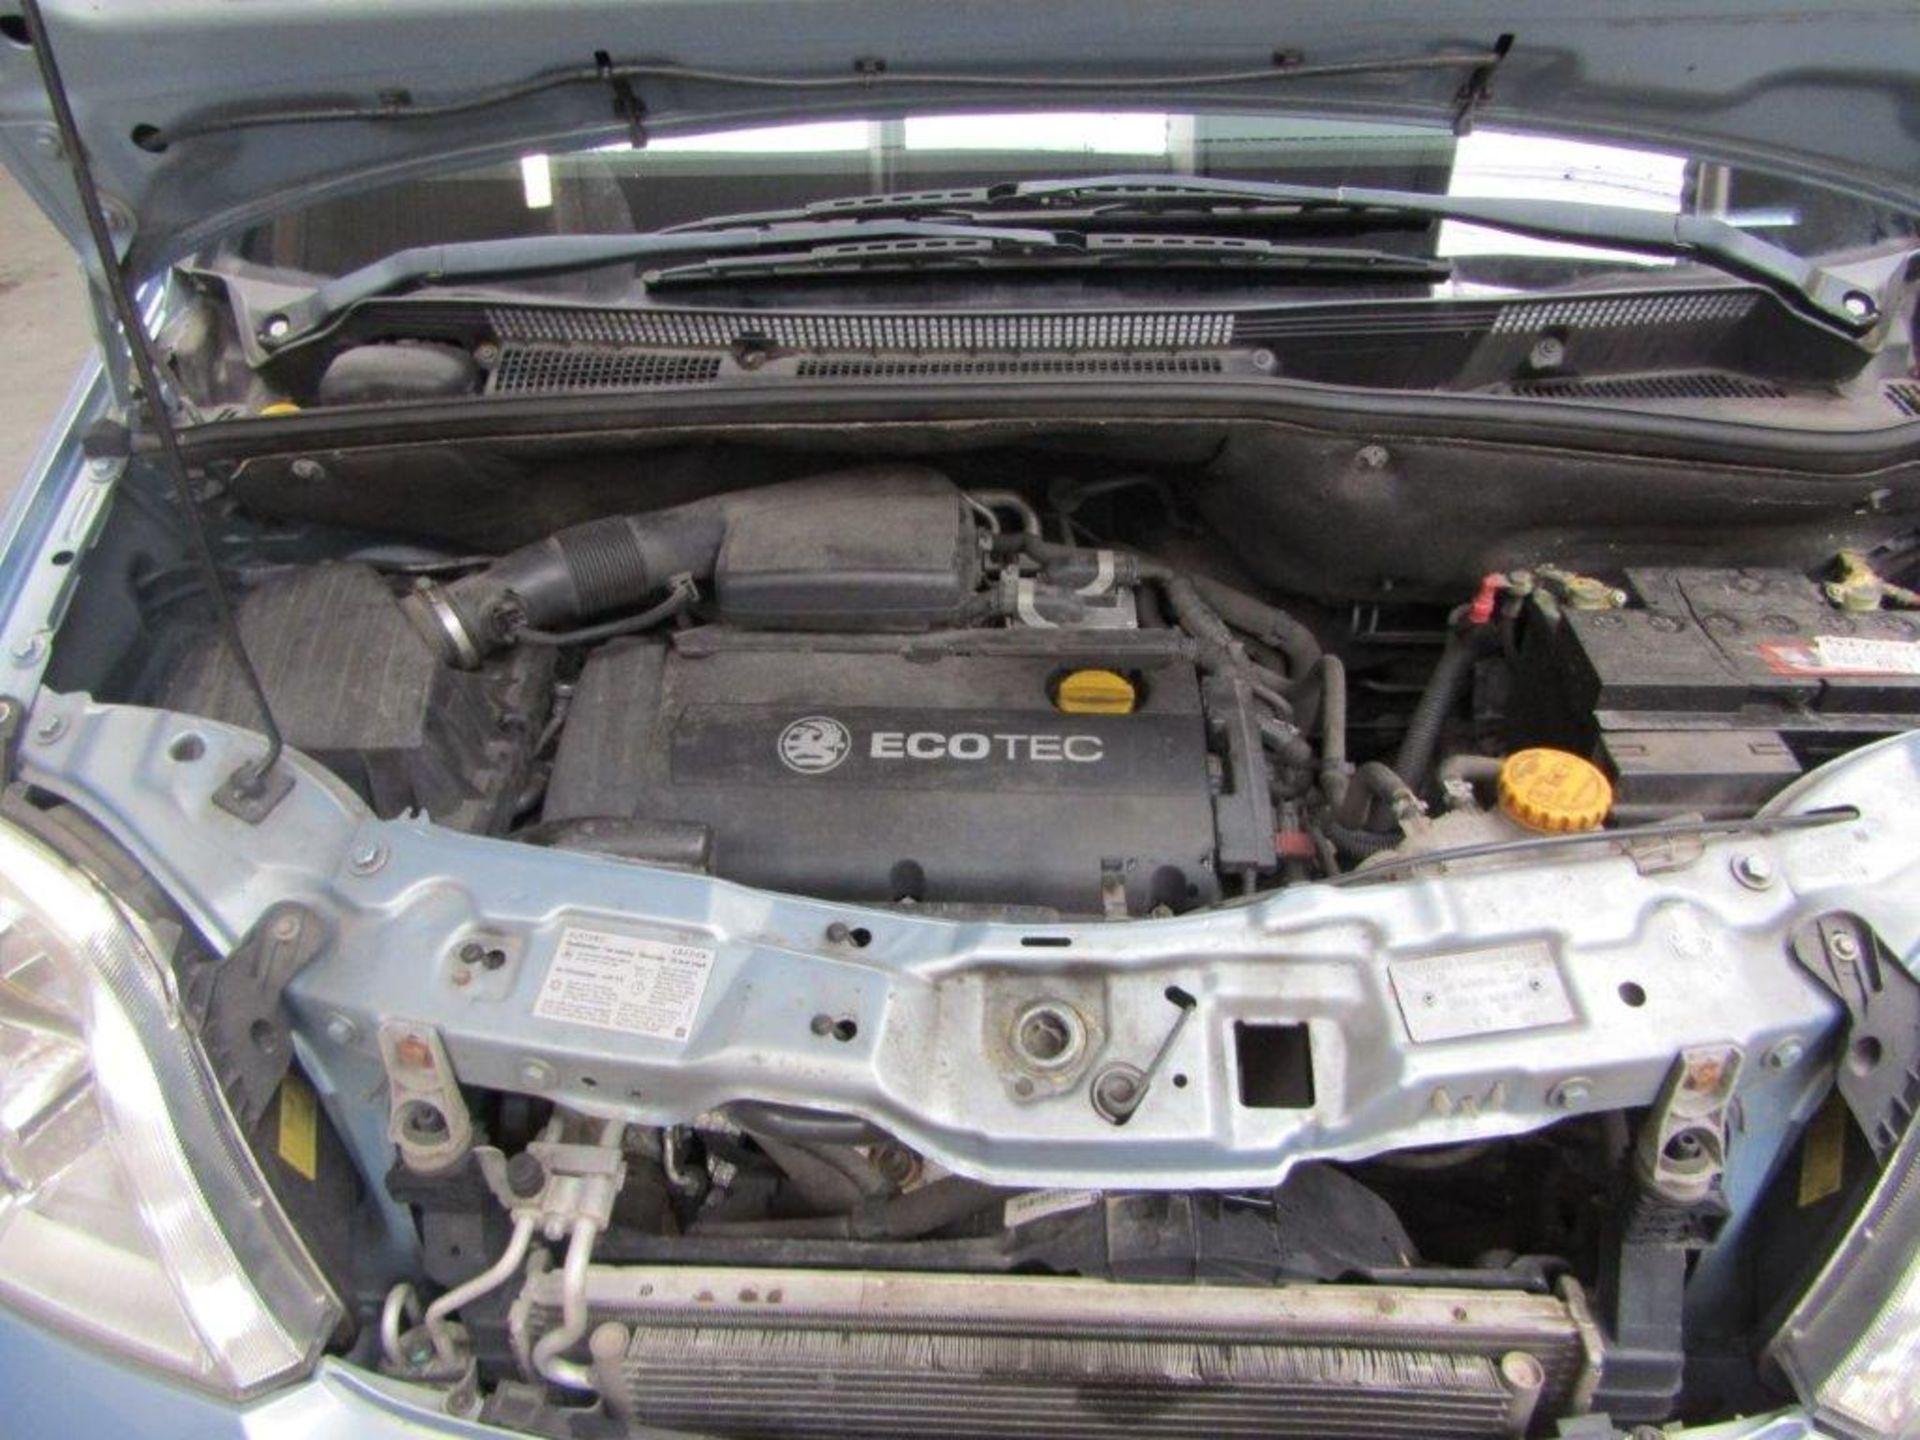 58 08 Vauxhall Meriva Design - Image 19 of 25